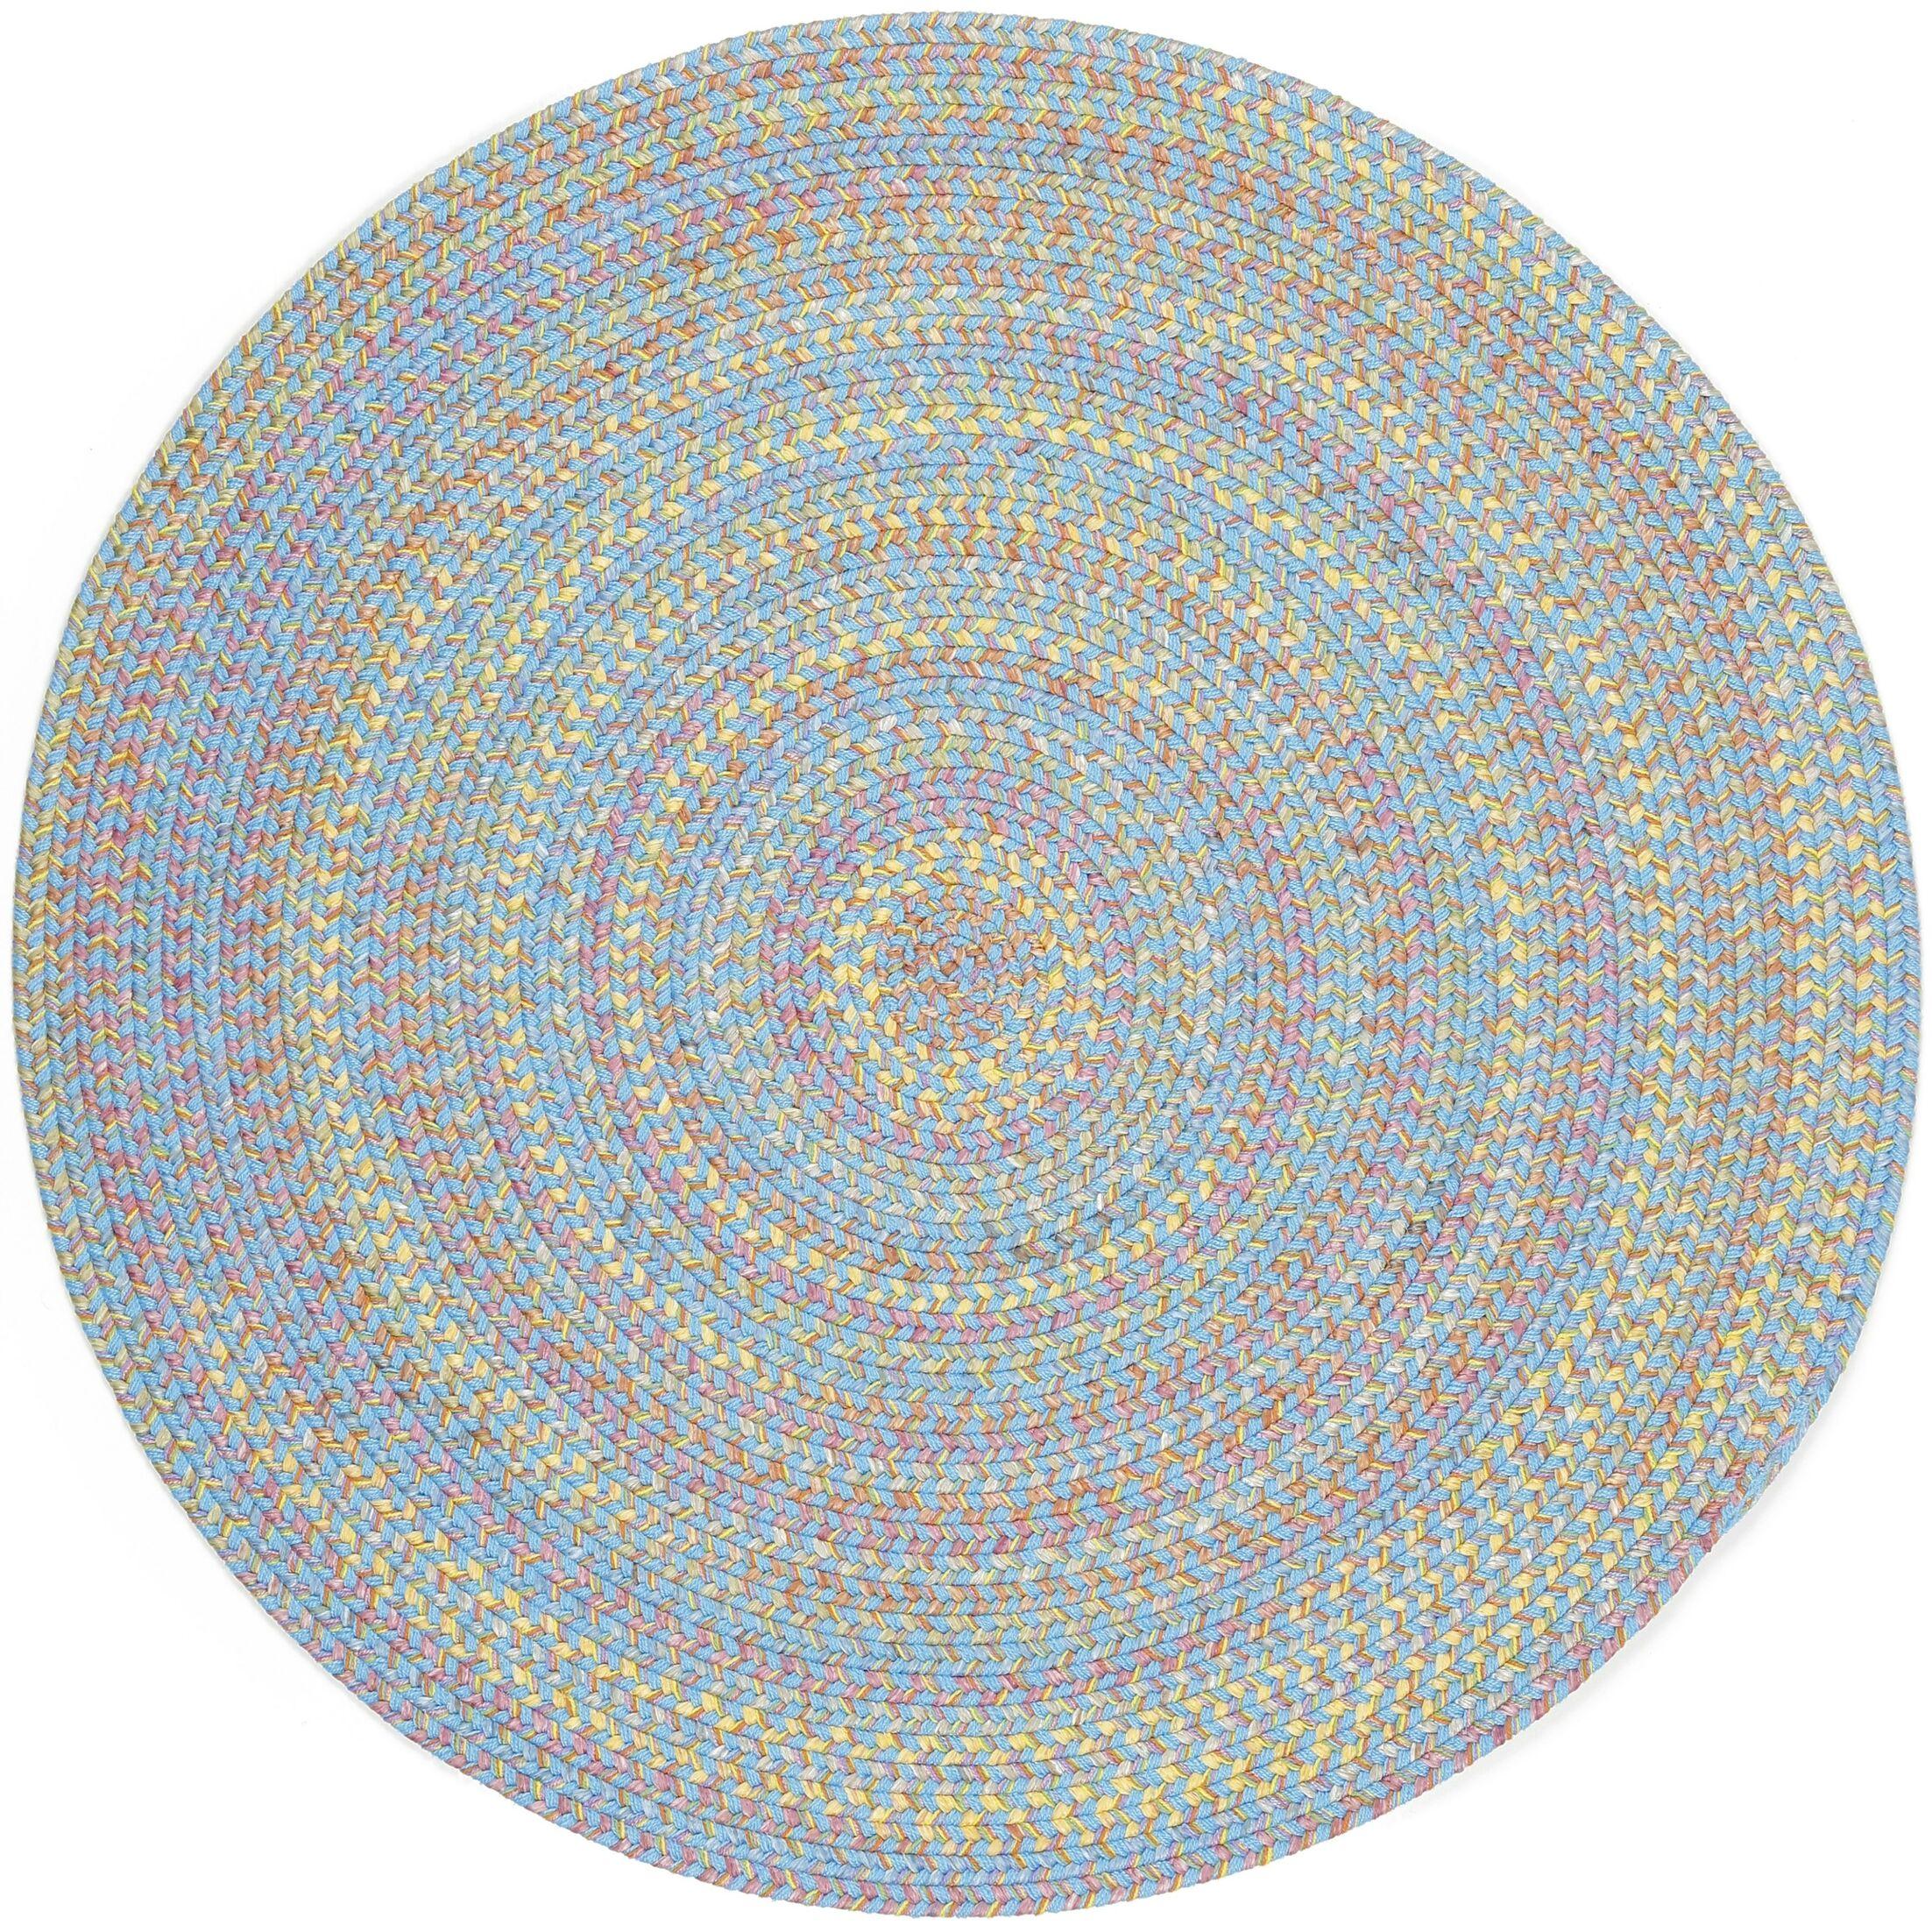 Sahawar Blue Indoor/Outdoor Area Rug Rug Size: Round 10'